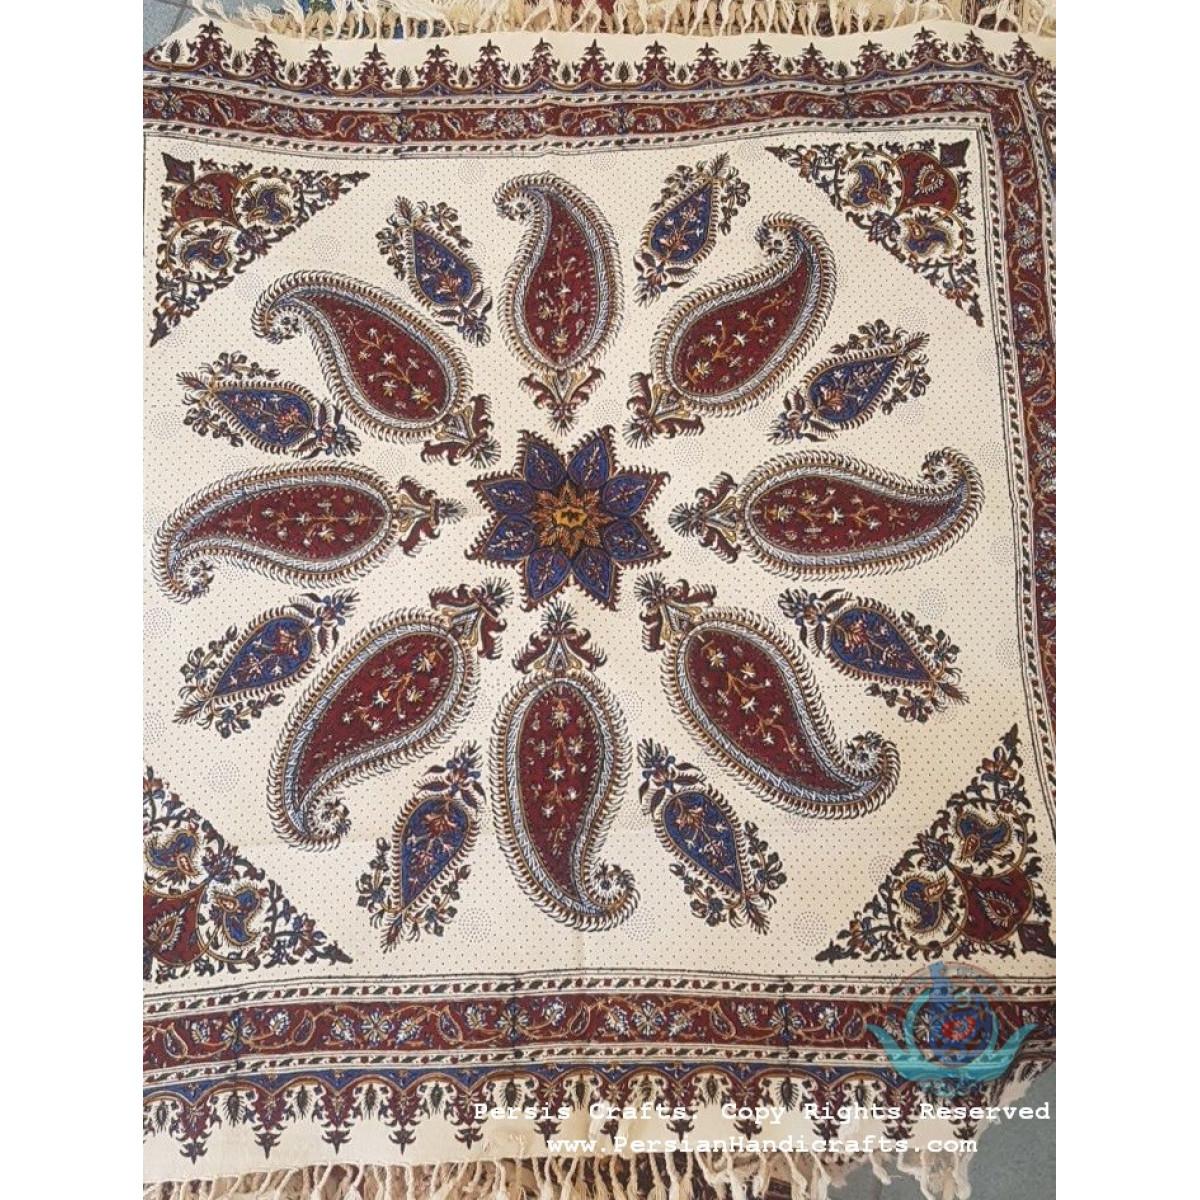 Hand Printed Ghalamkar Tablecloth - PGH1002-Persian Handicrafts